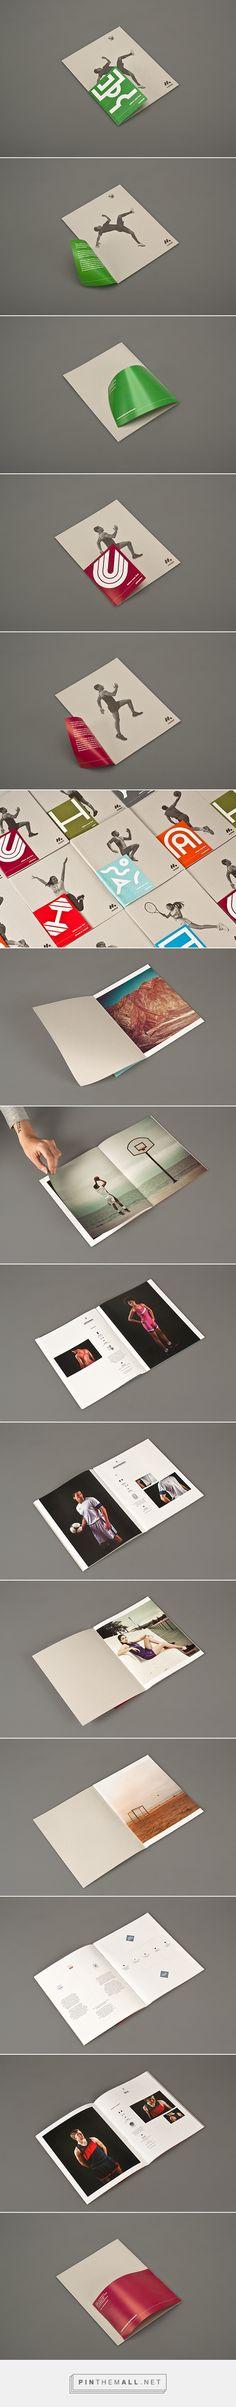 Mobel Sport Catalogs